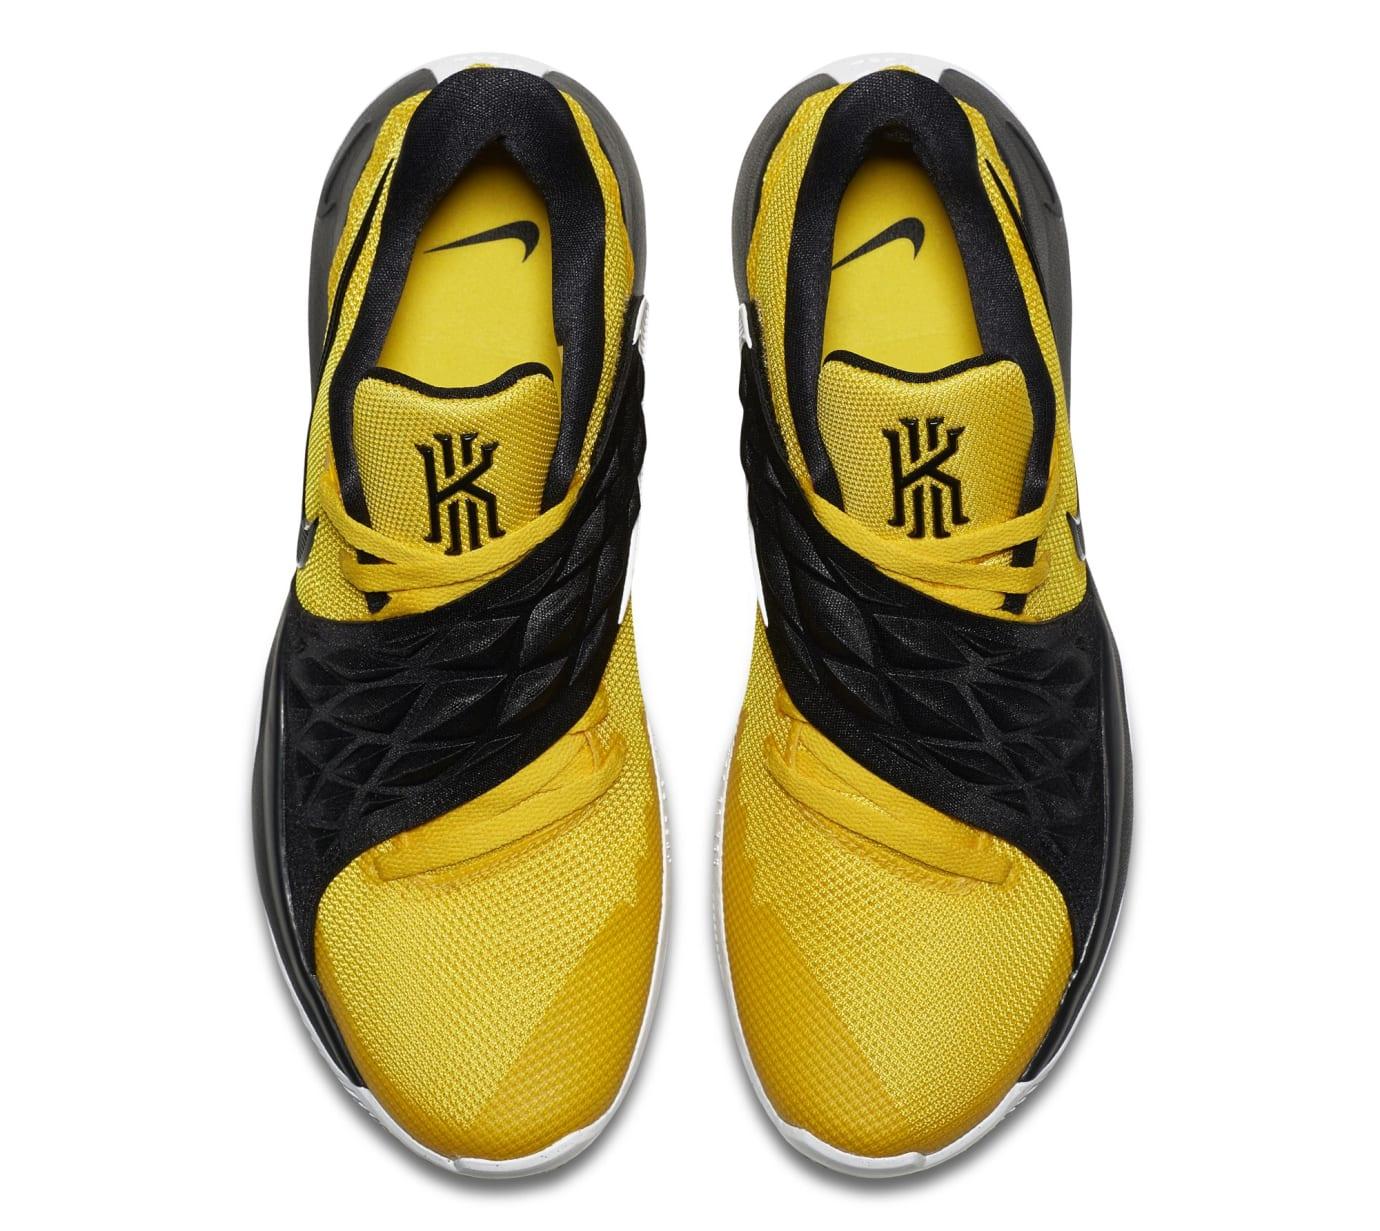 best sneakers 35703 90e81 Image via Nike US11 · Nike Kyrie Low  Amarillo Black  (Top)